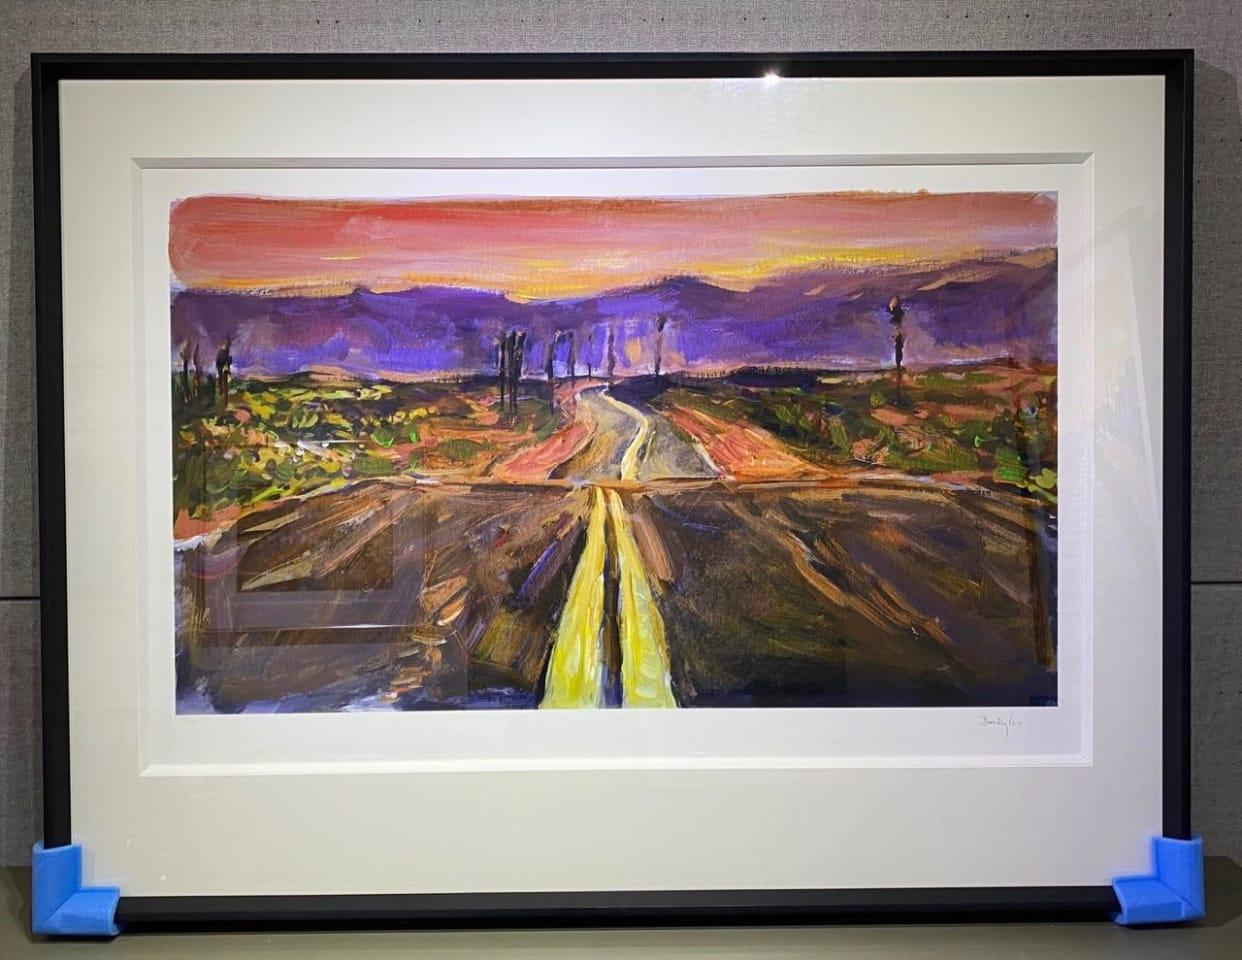 Bob Dylan, Endless Highway - Large, 2016